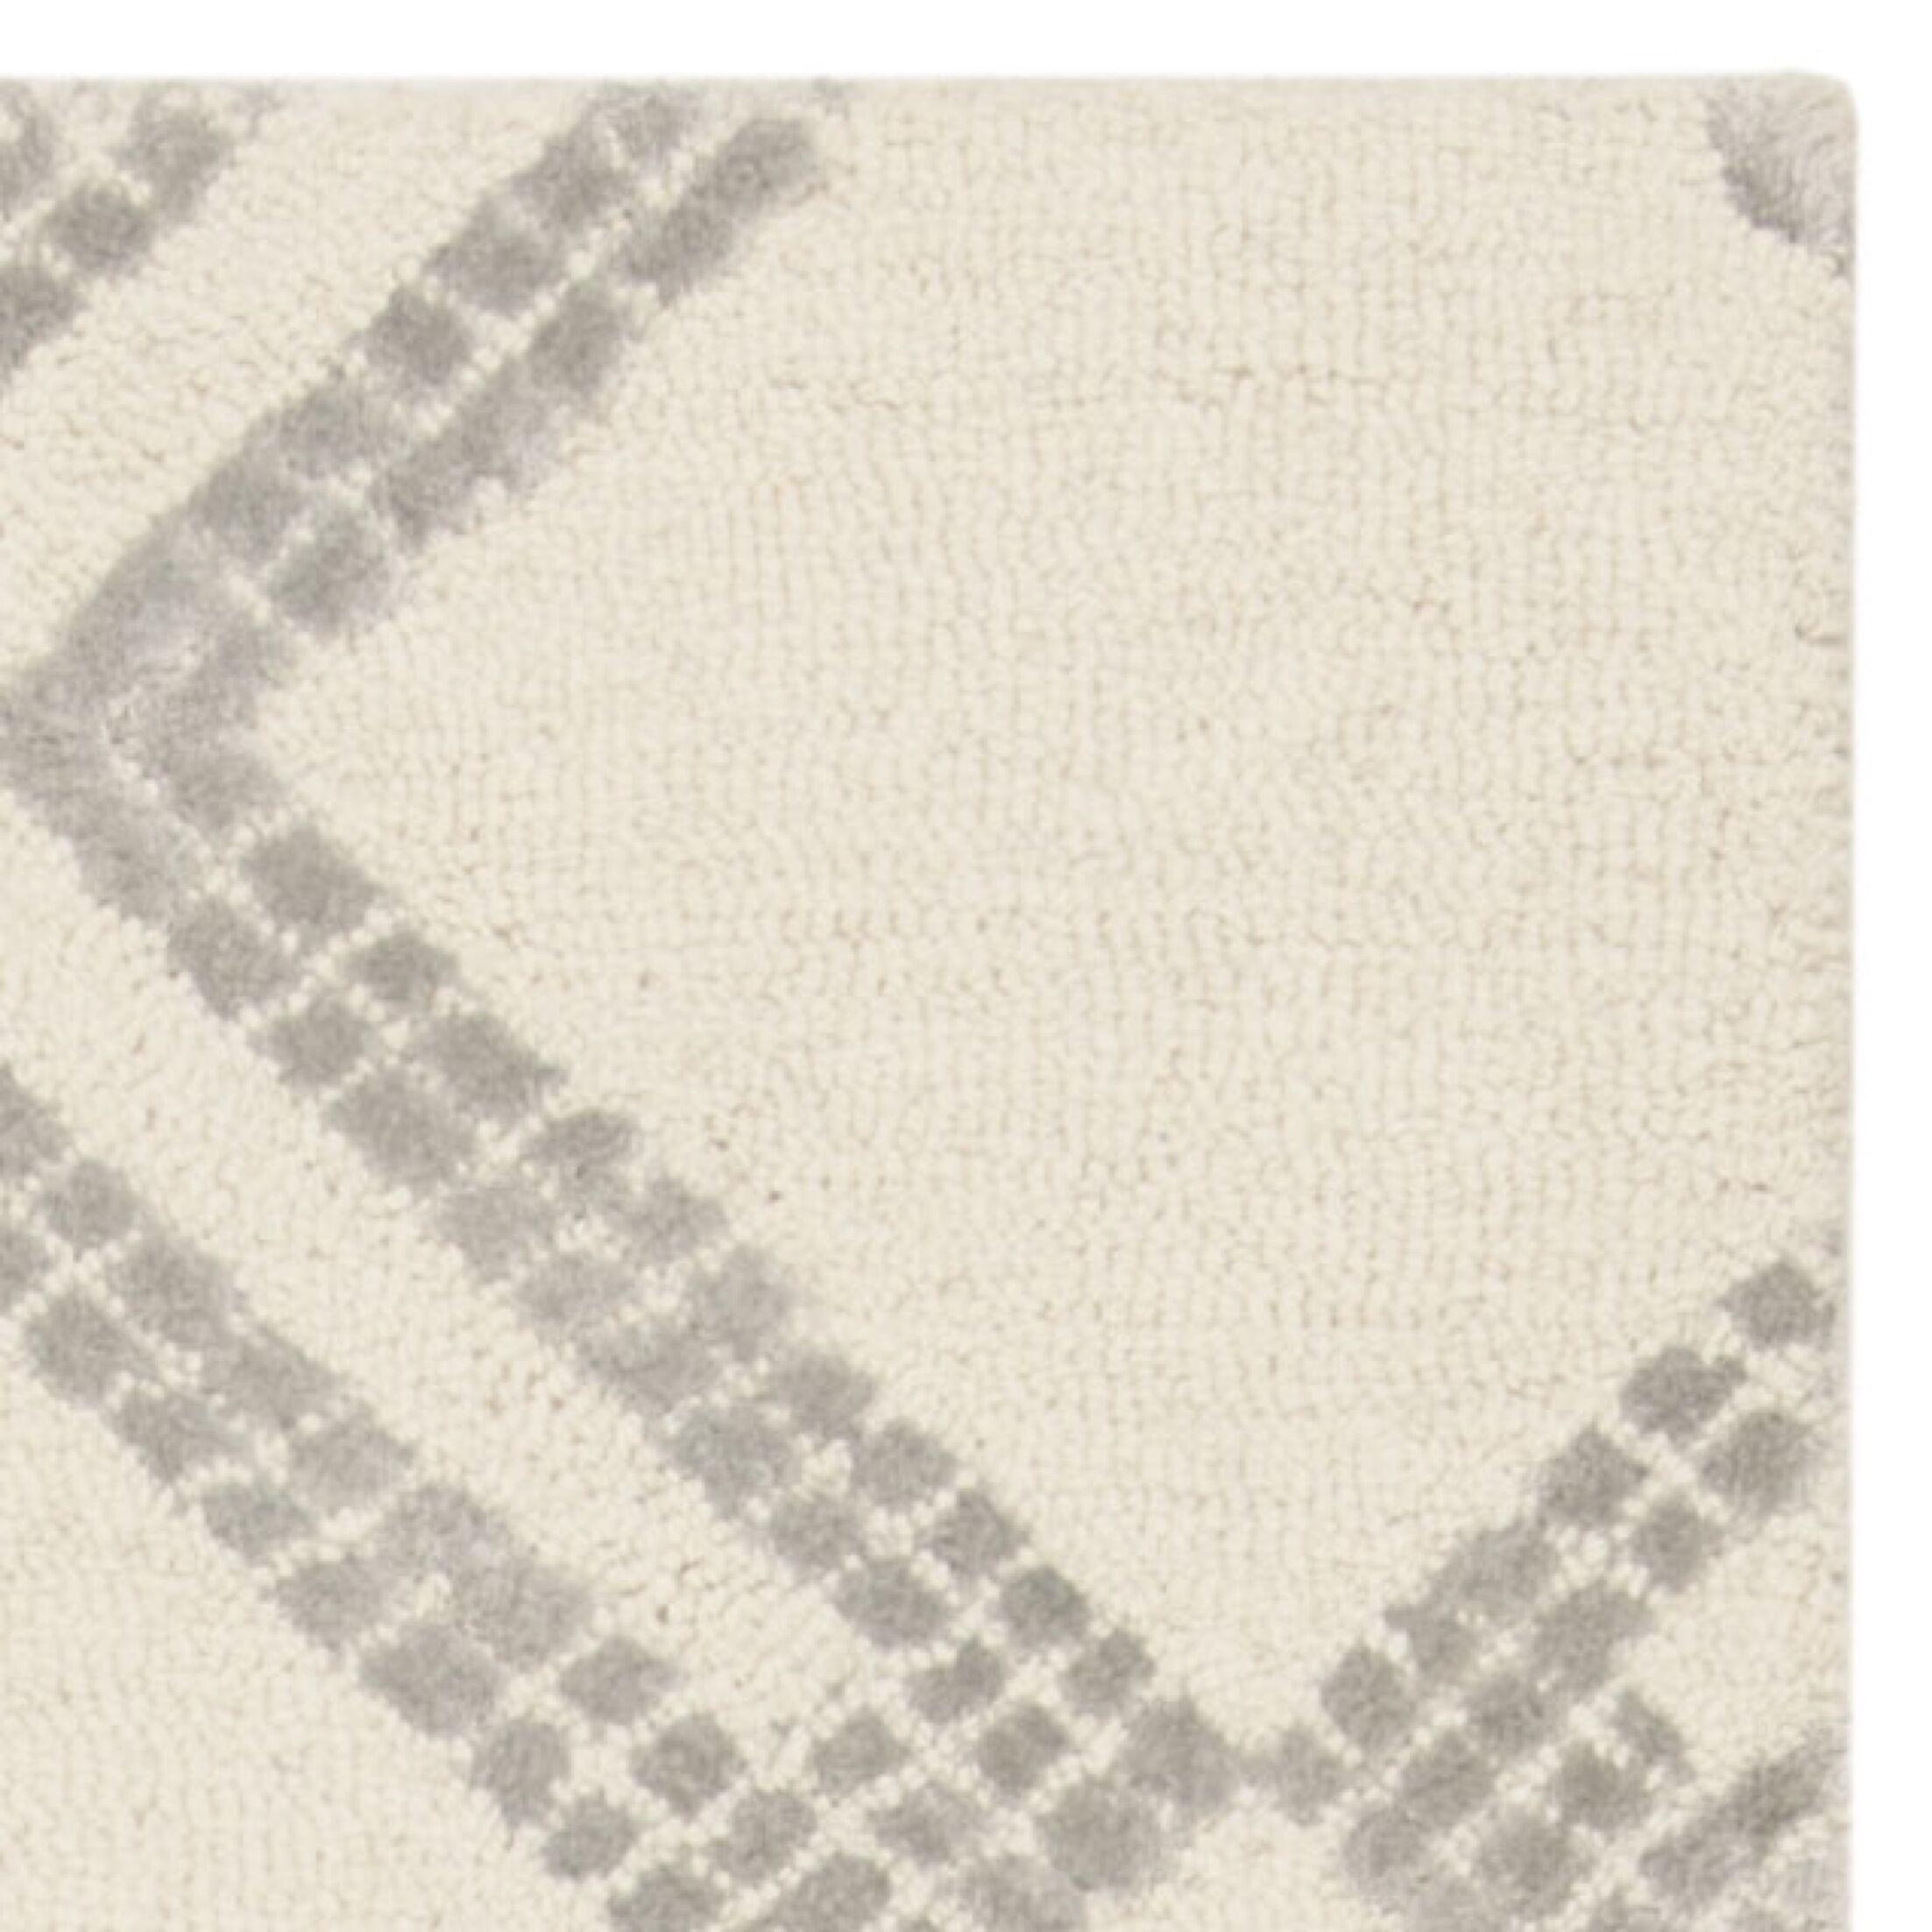 Blokzijl Hand-Tufted Ivory/Silver Area Rug Rug Size: Rectangle 8' x 10'